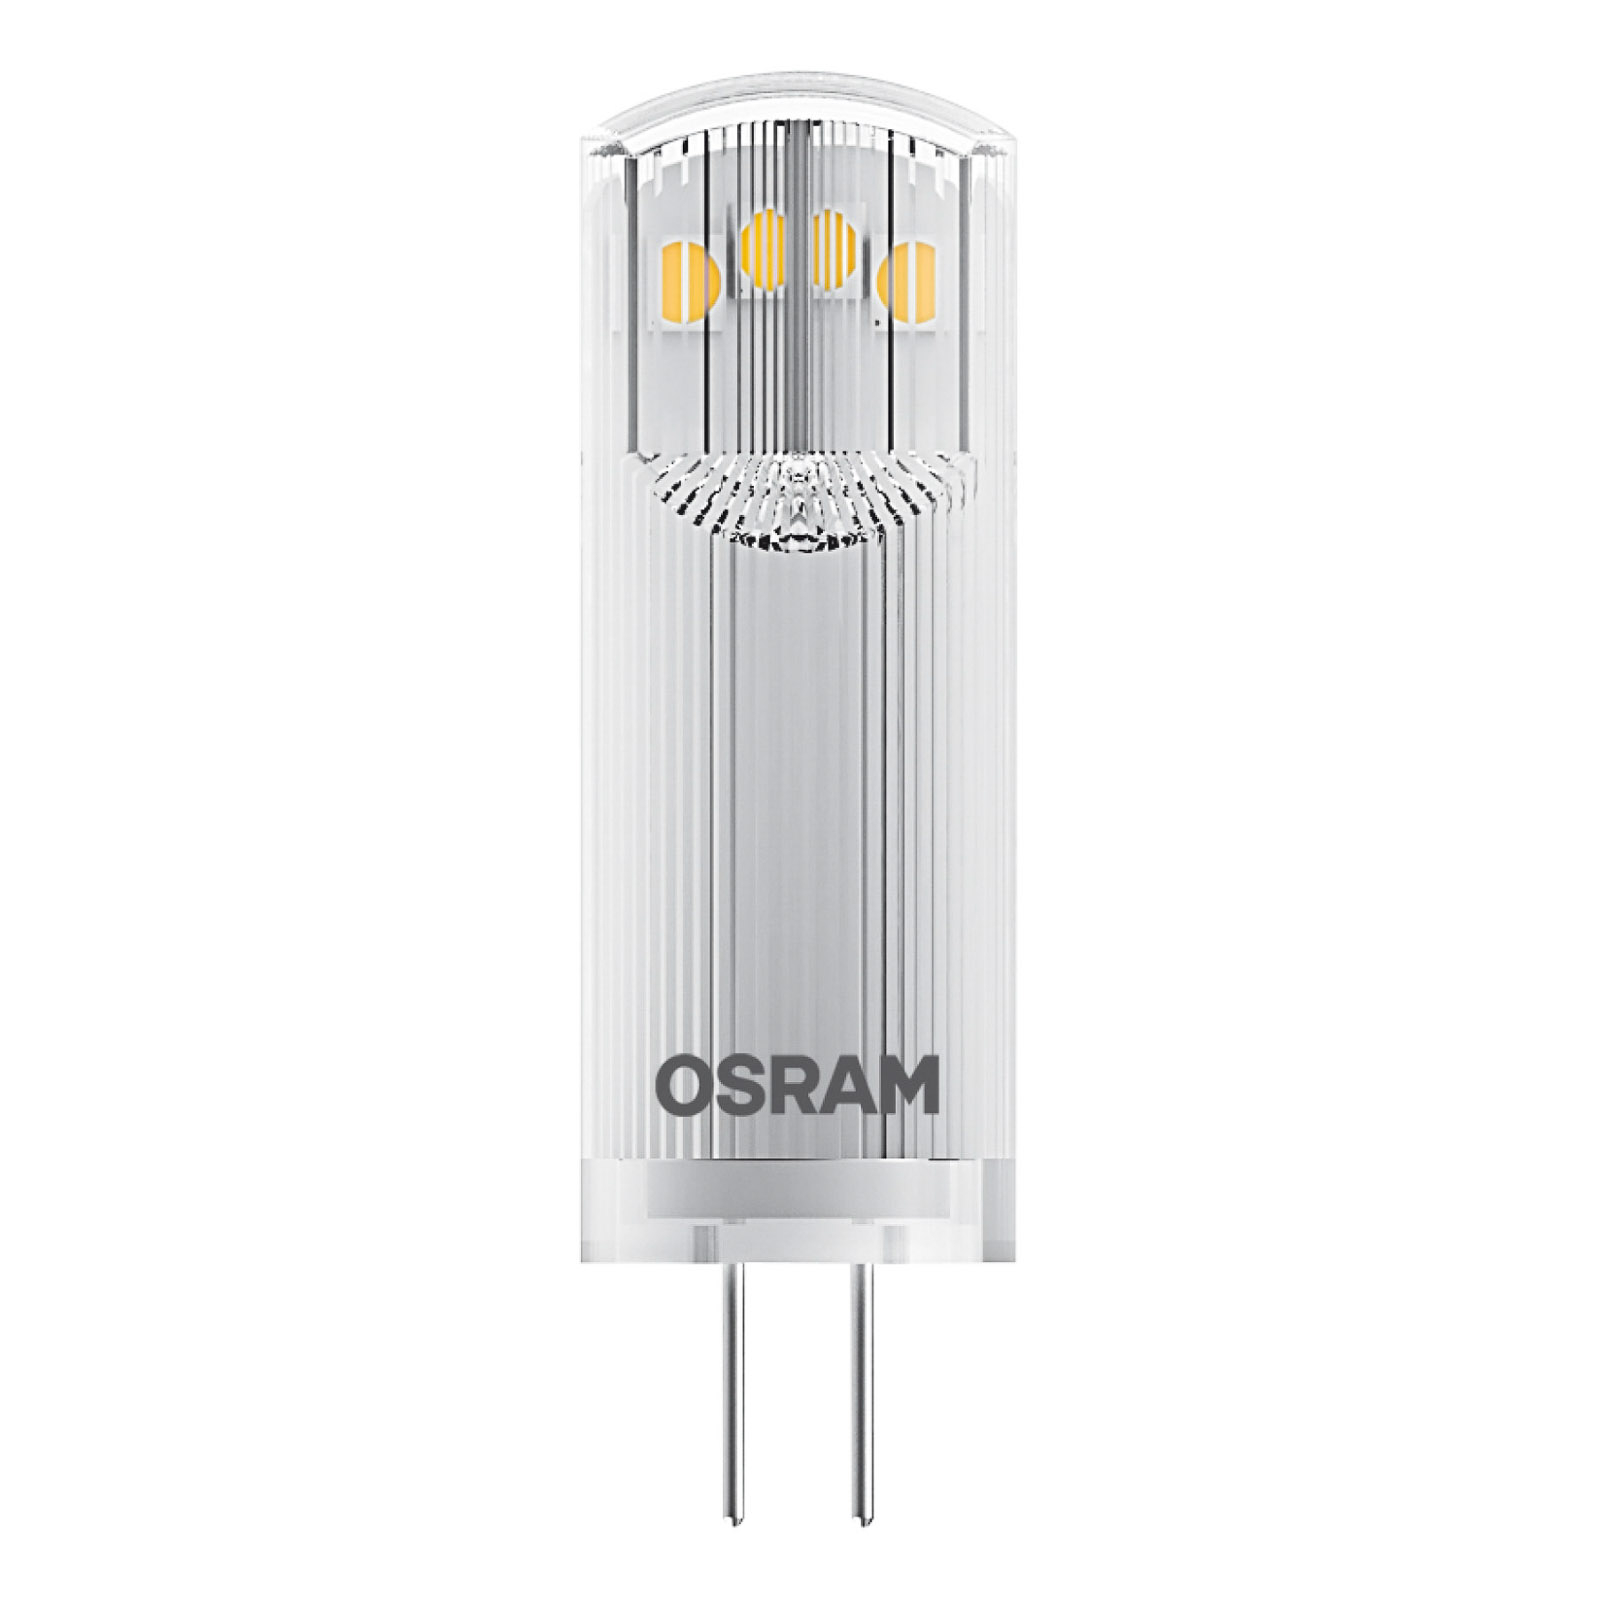 OSRAM LED-Lampe G4 Star Pin 1,8 W  2.700K